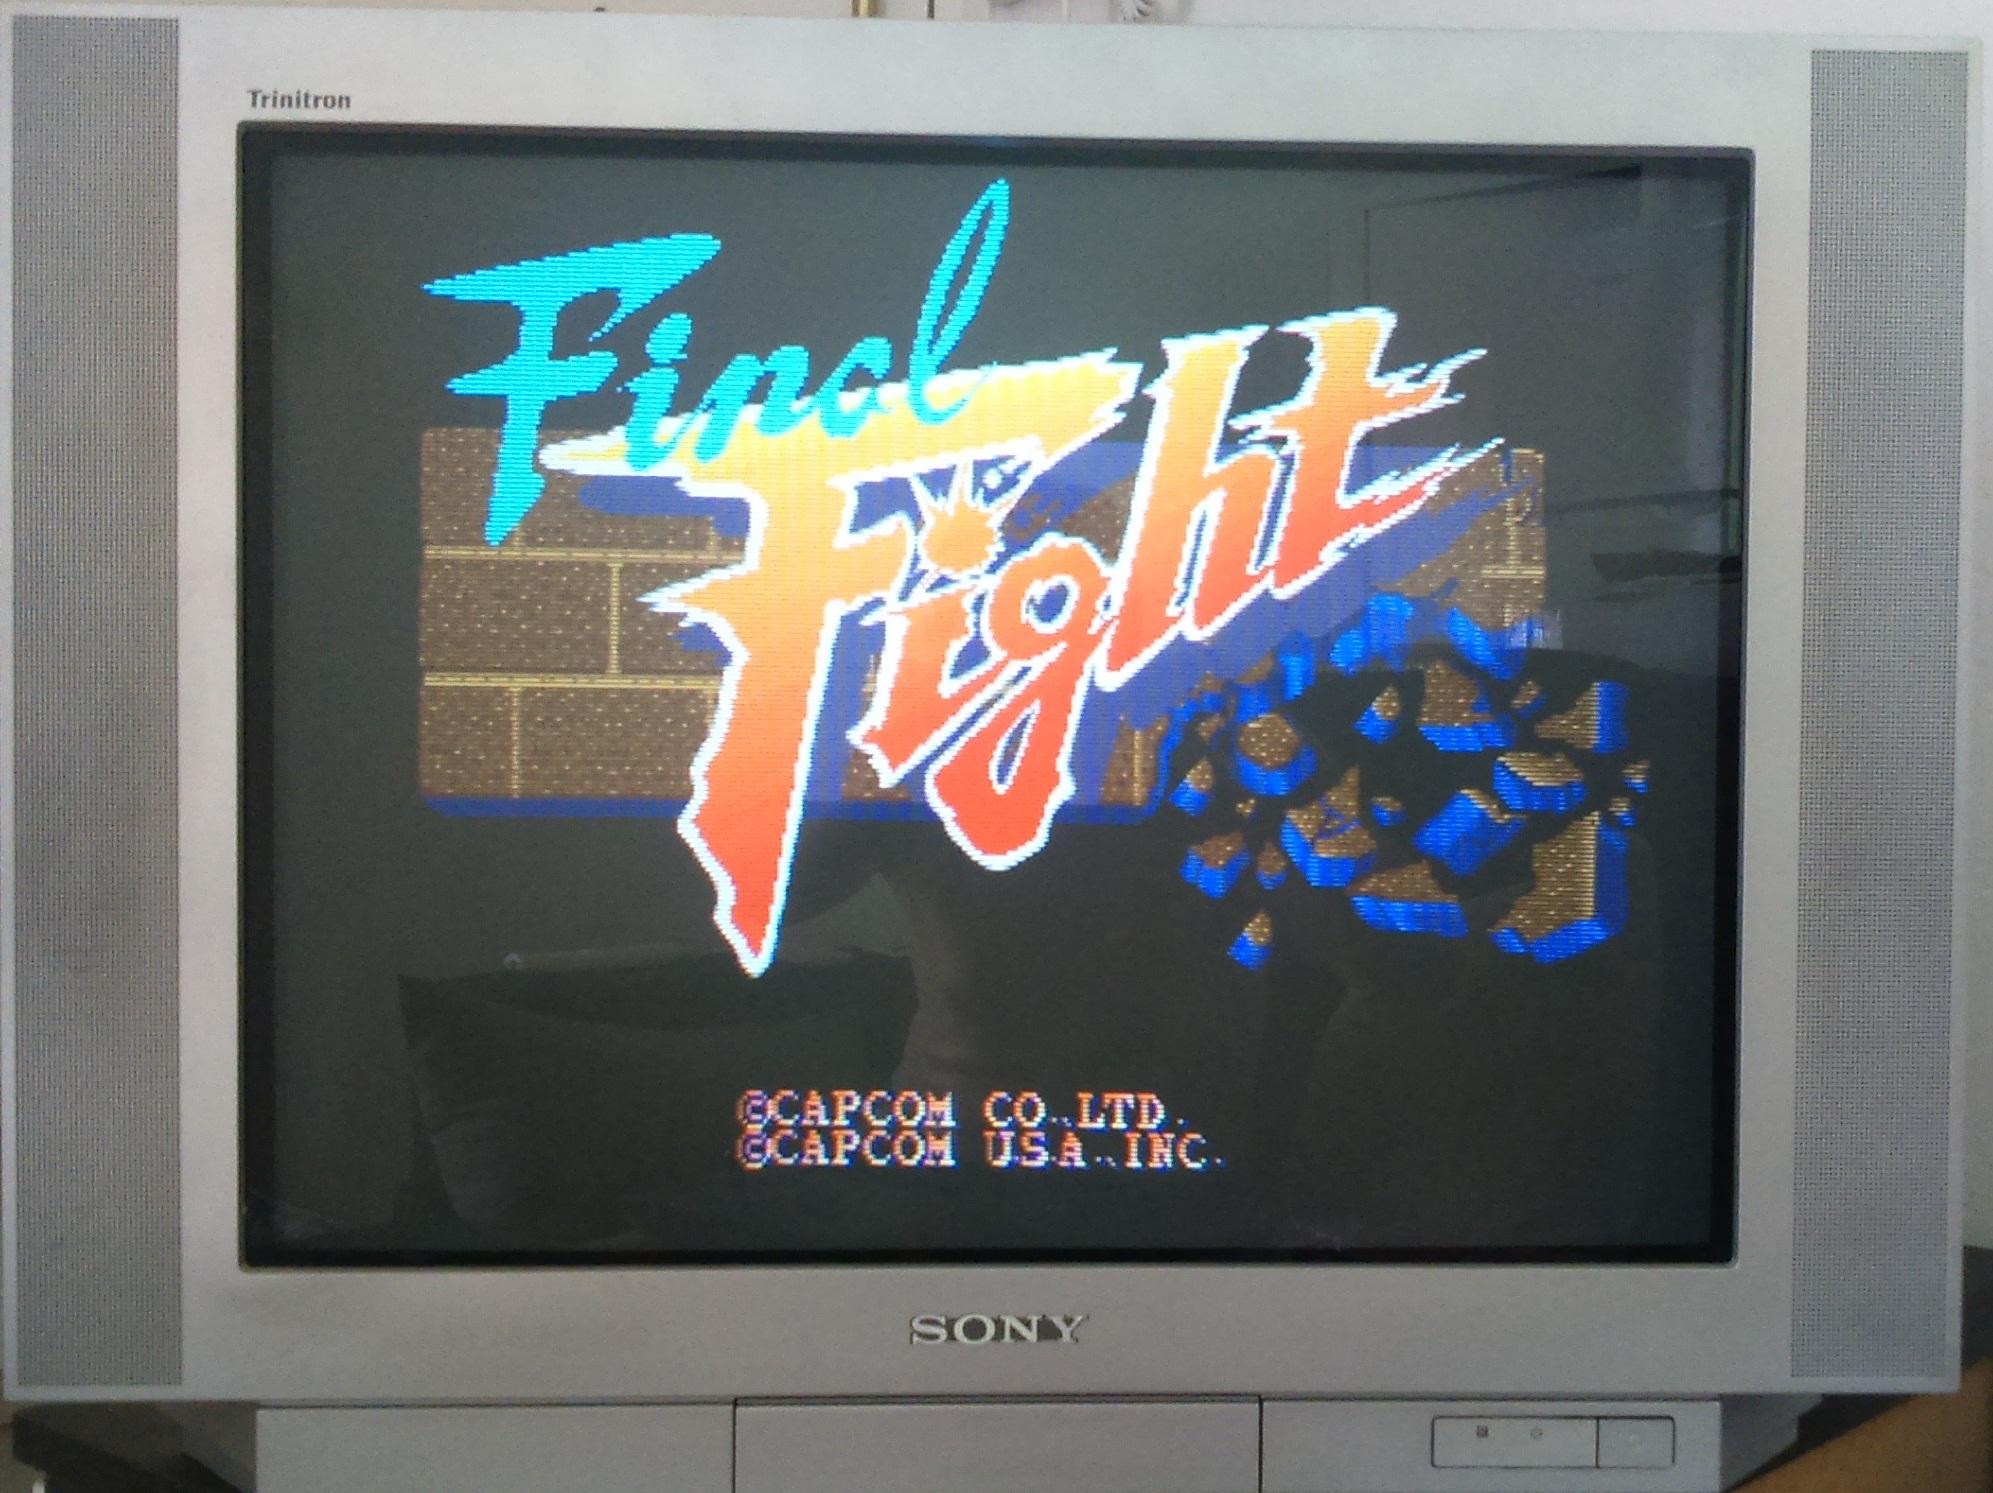 Final_Fight_screen.jpg